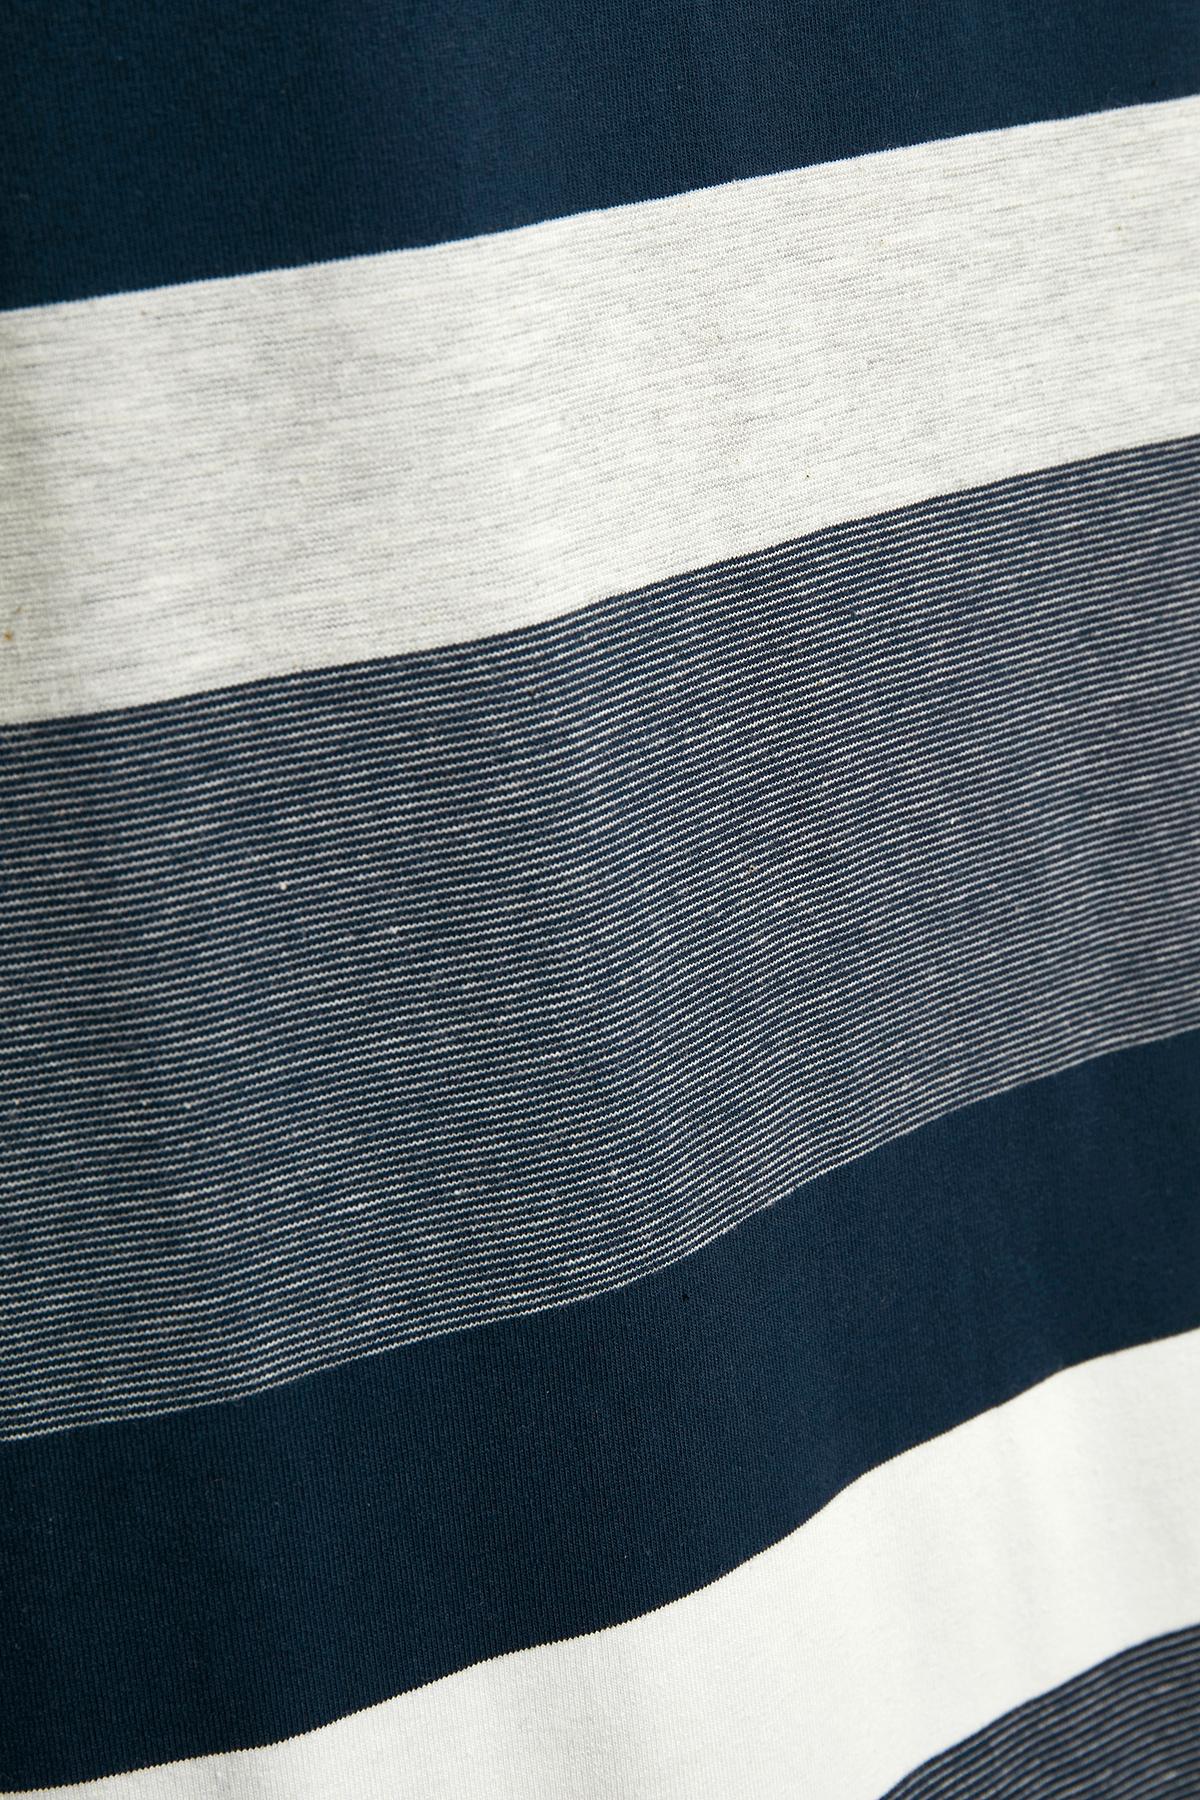 Marineblauw/off-white Jurk van Bon'A Parte – Door Marineblauw/off-white Jurk van maat. S-2XL hier